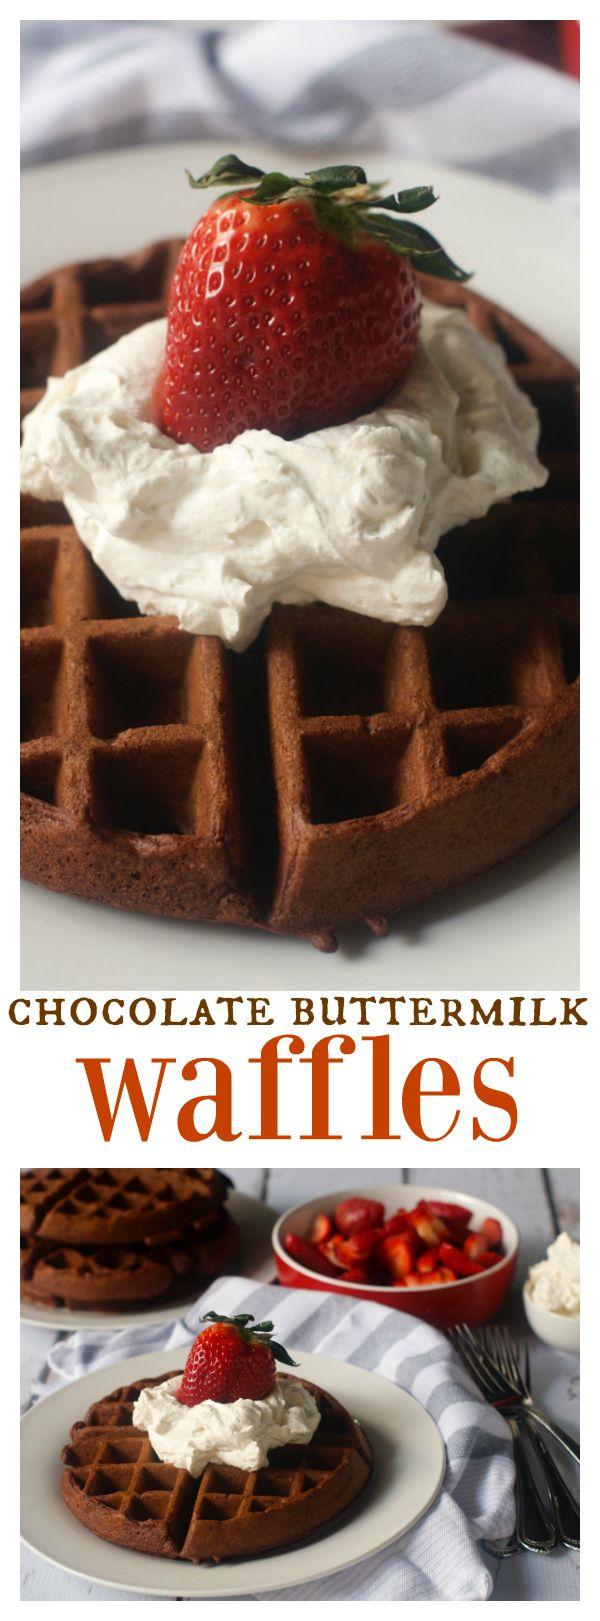 17 Best ideas about Buttermilk Waffles on Pinterest ...